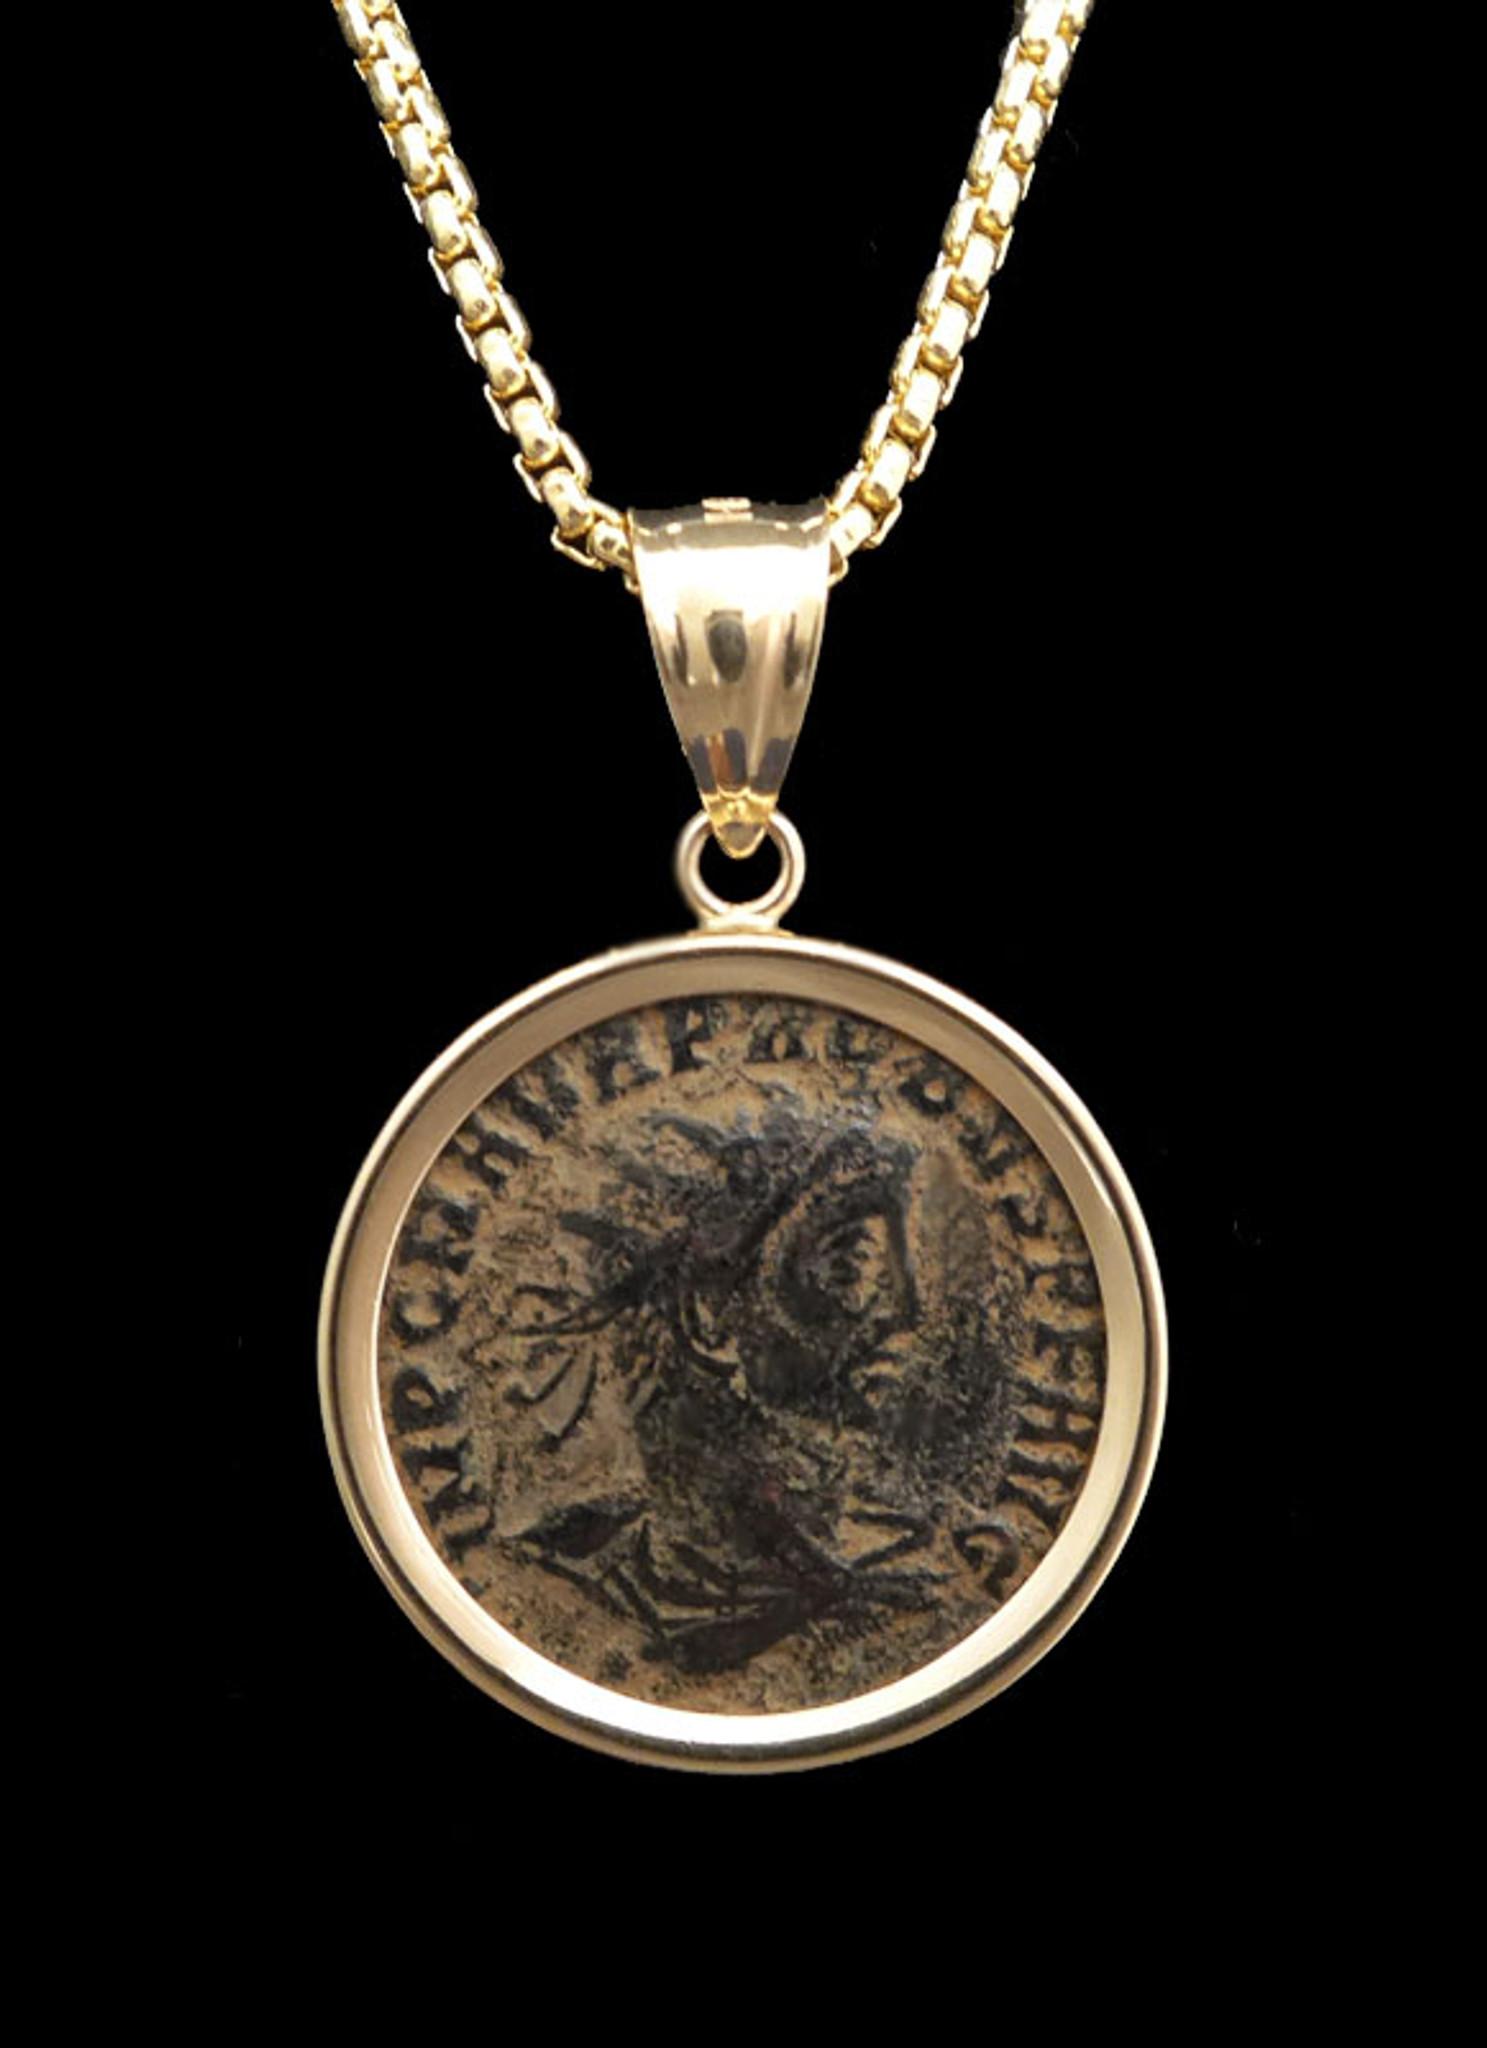 Genuine Ancient Roman Probus Coin Pendant